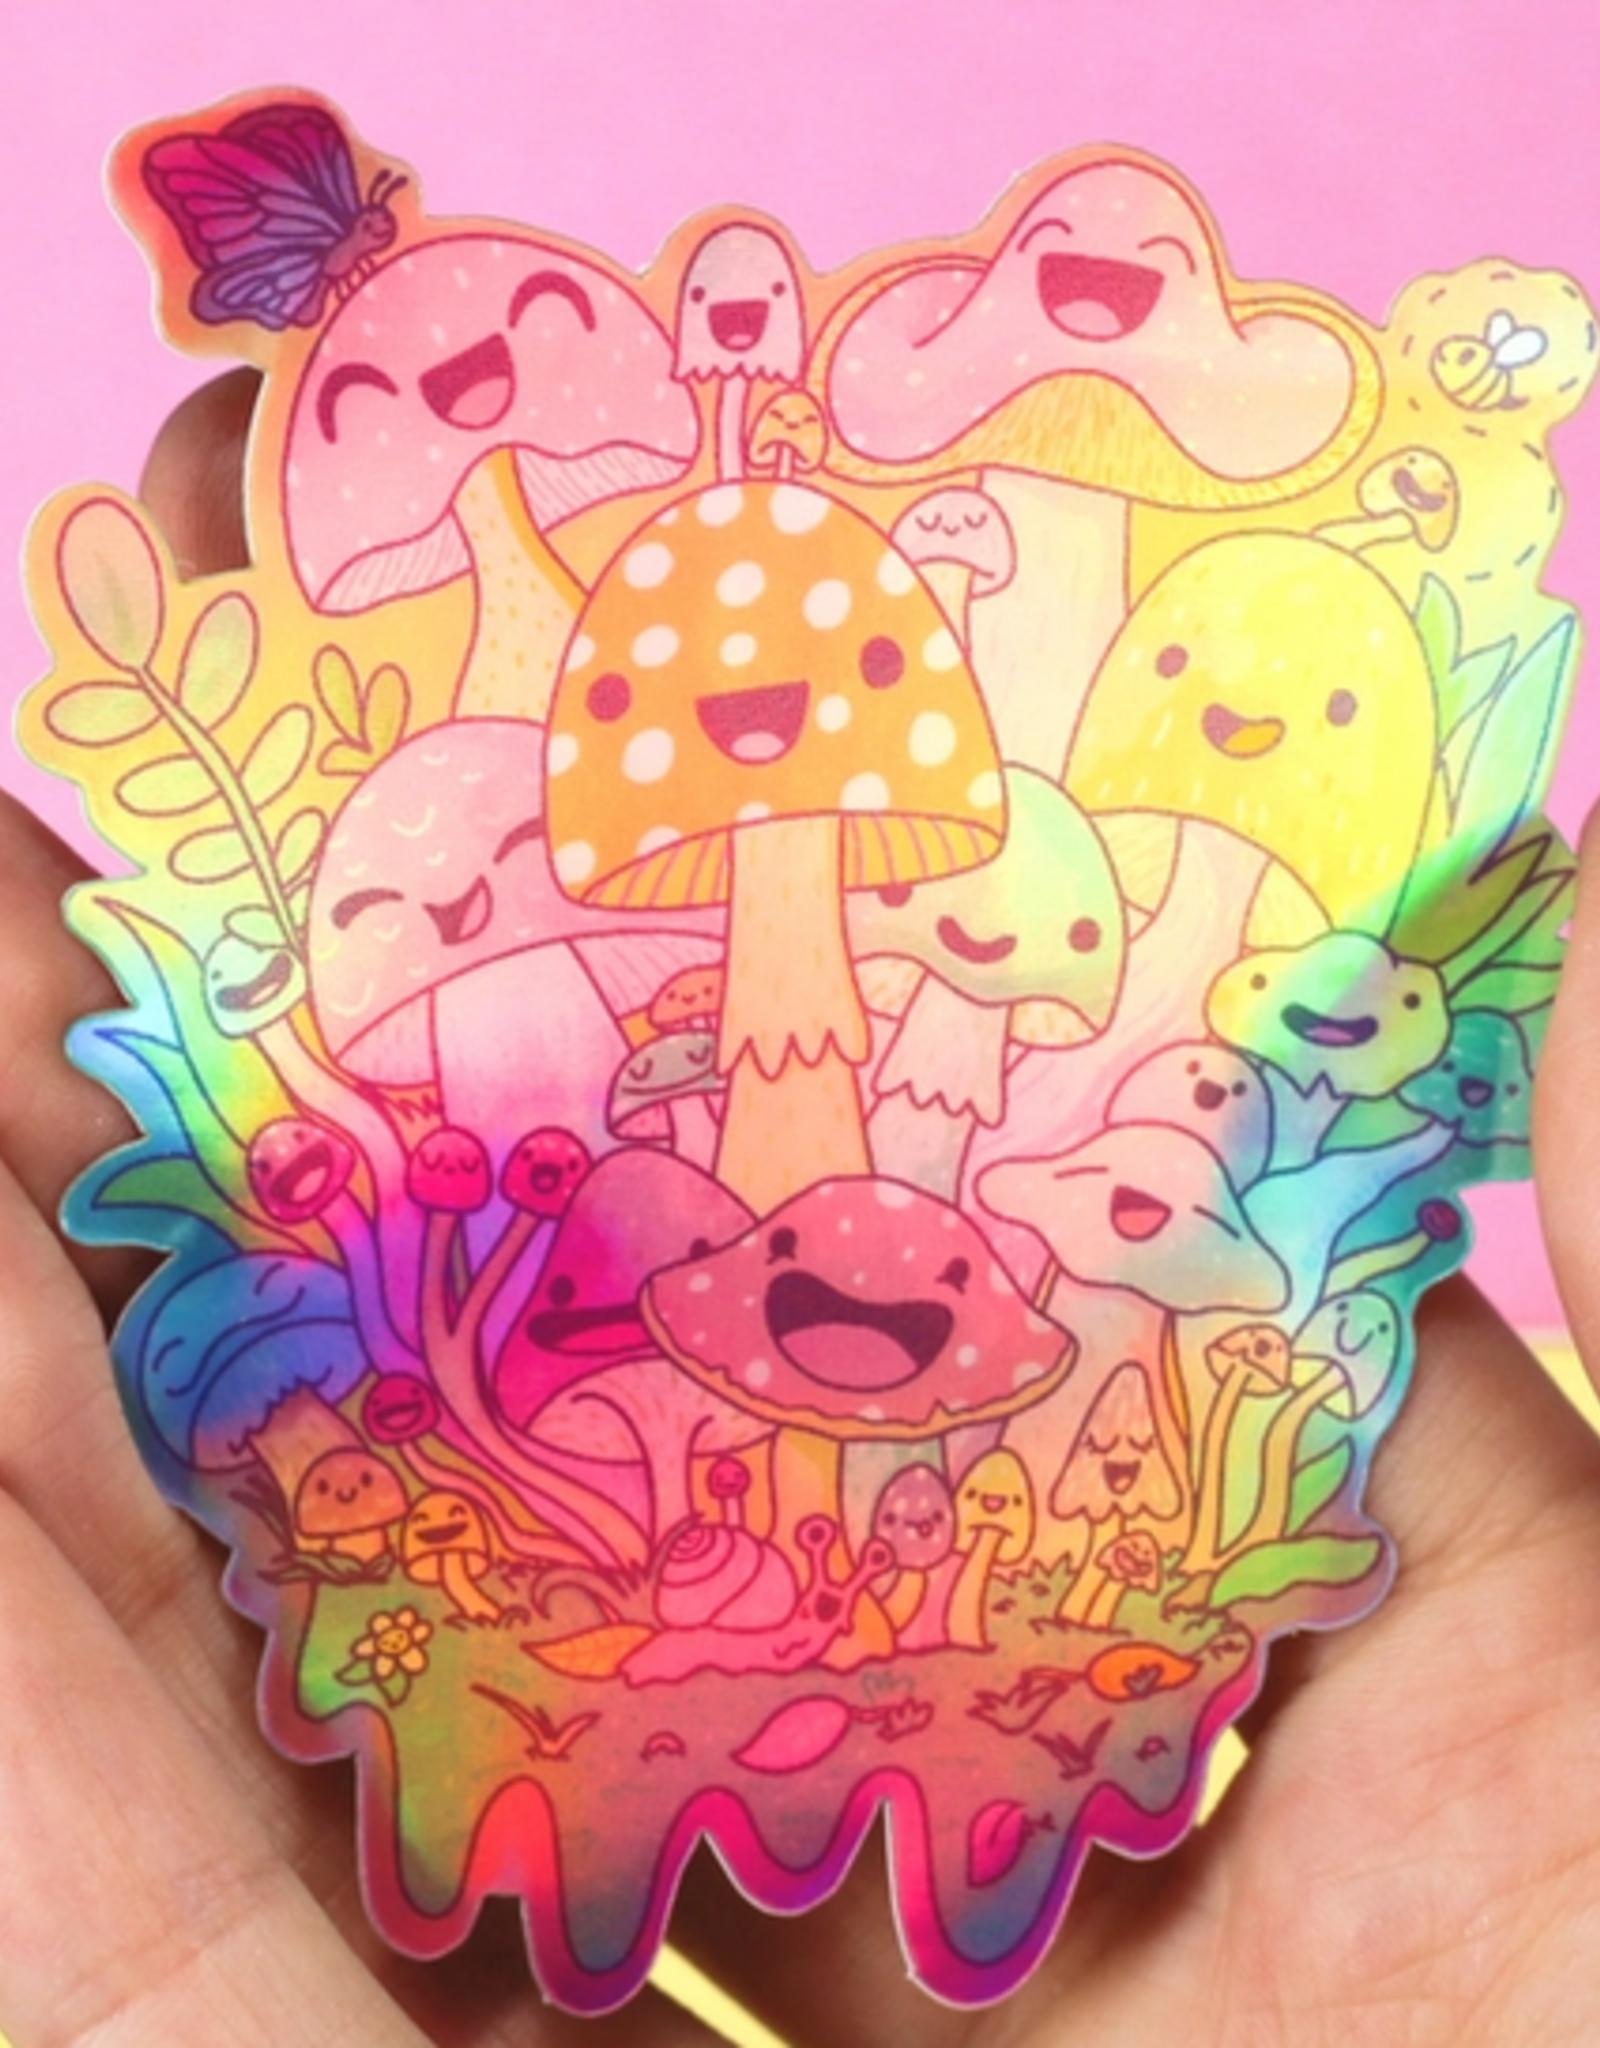 Turtle's Soup Happy Mushroom Psychedelic Vinyl Sticker (Holographic)